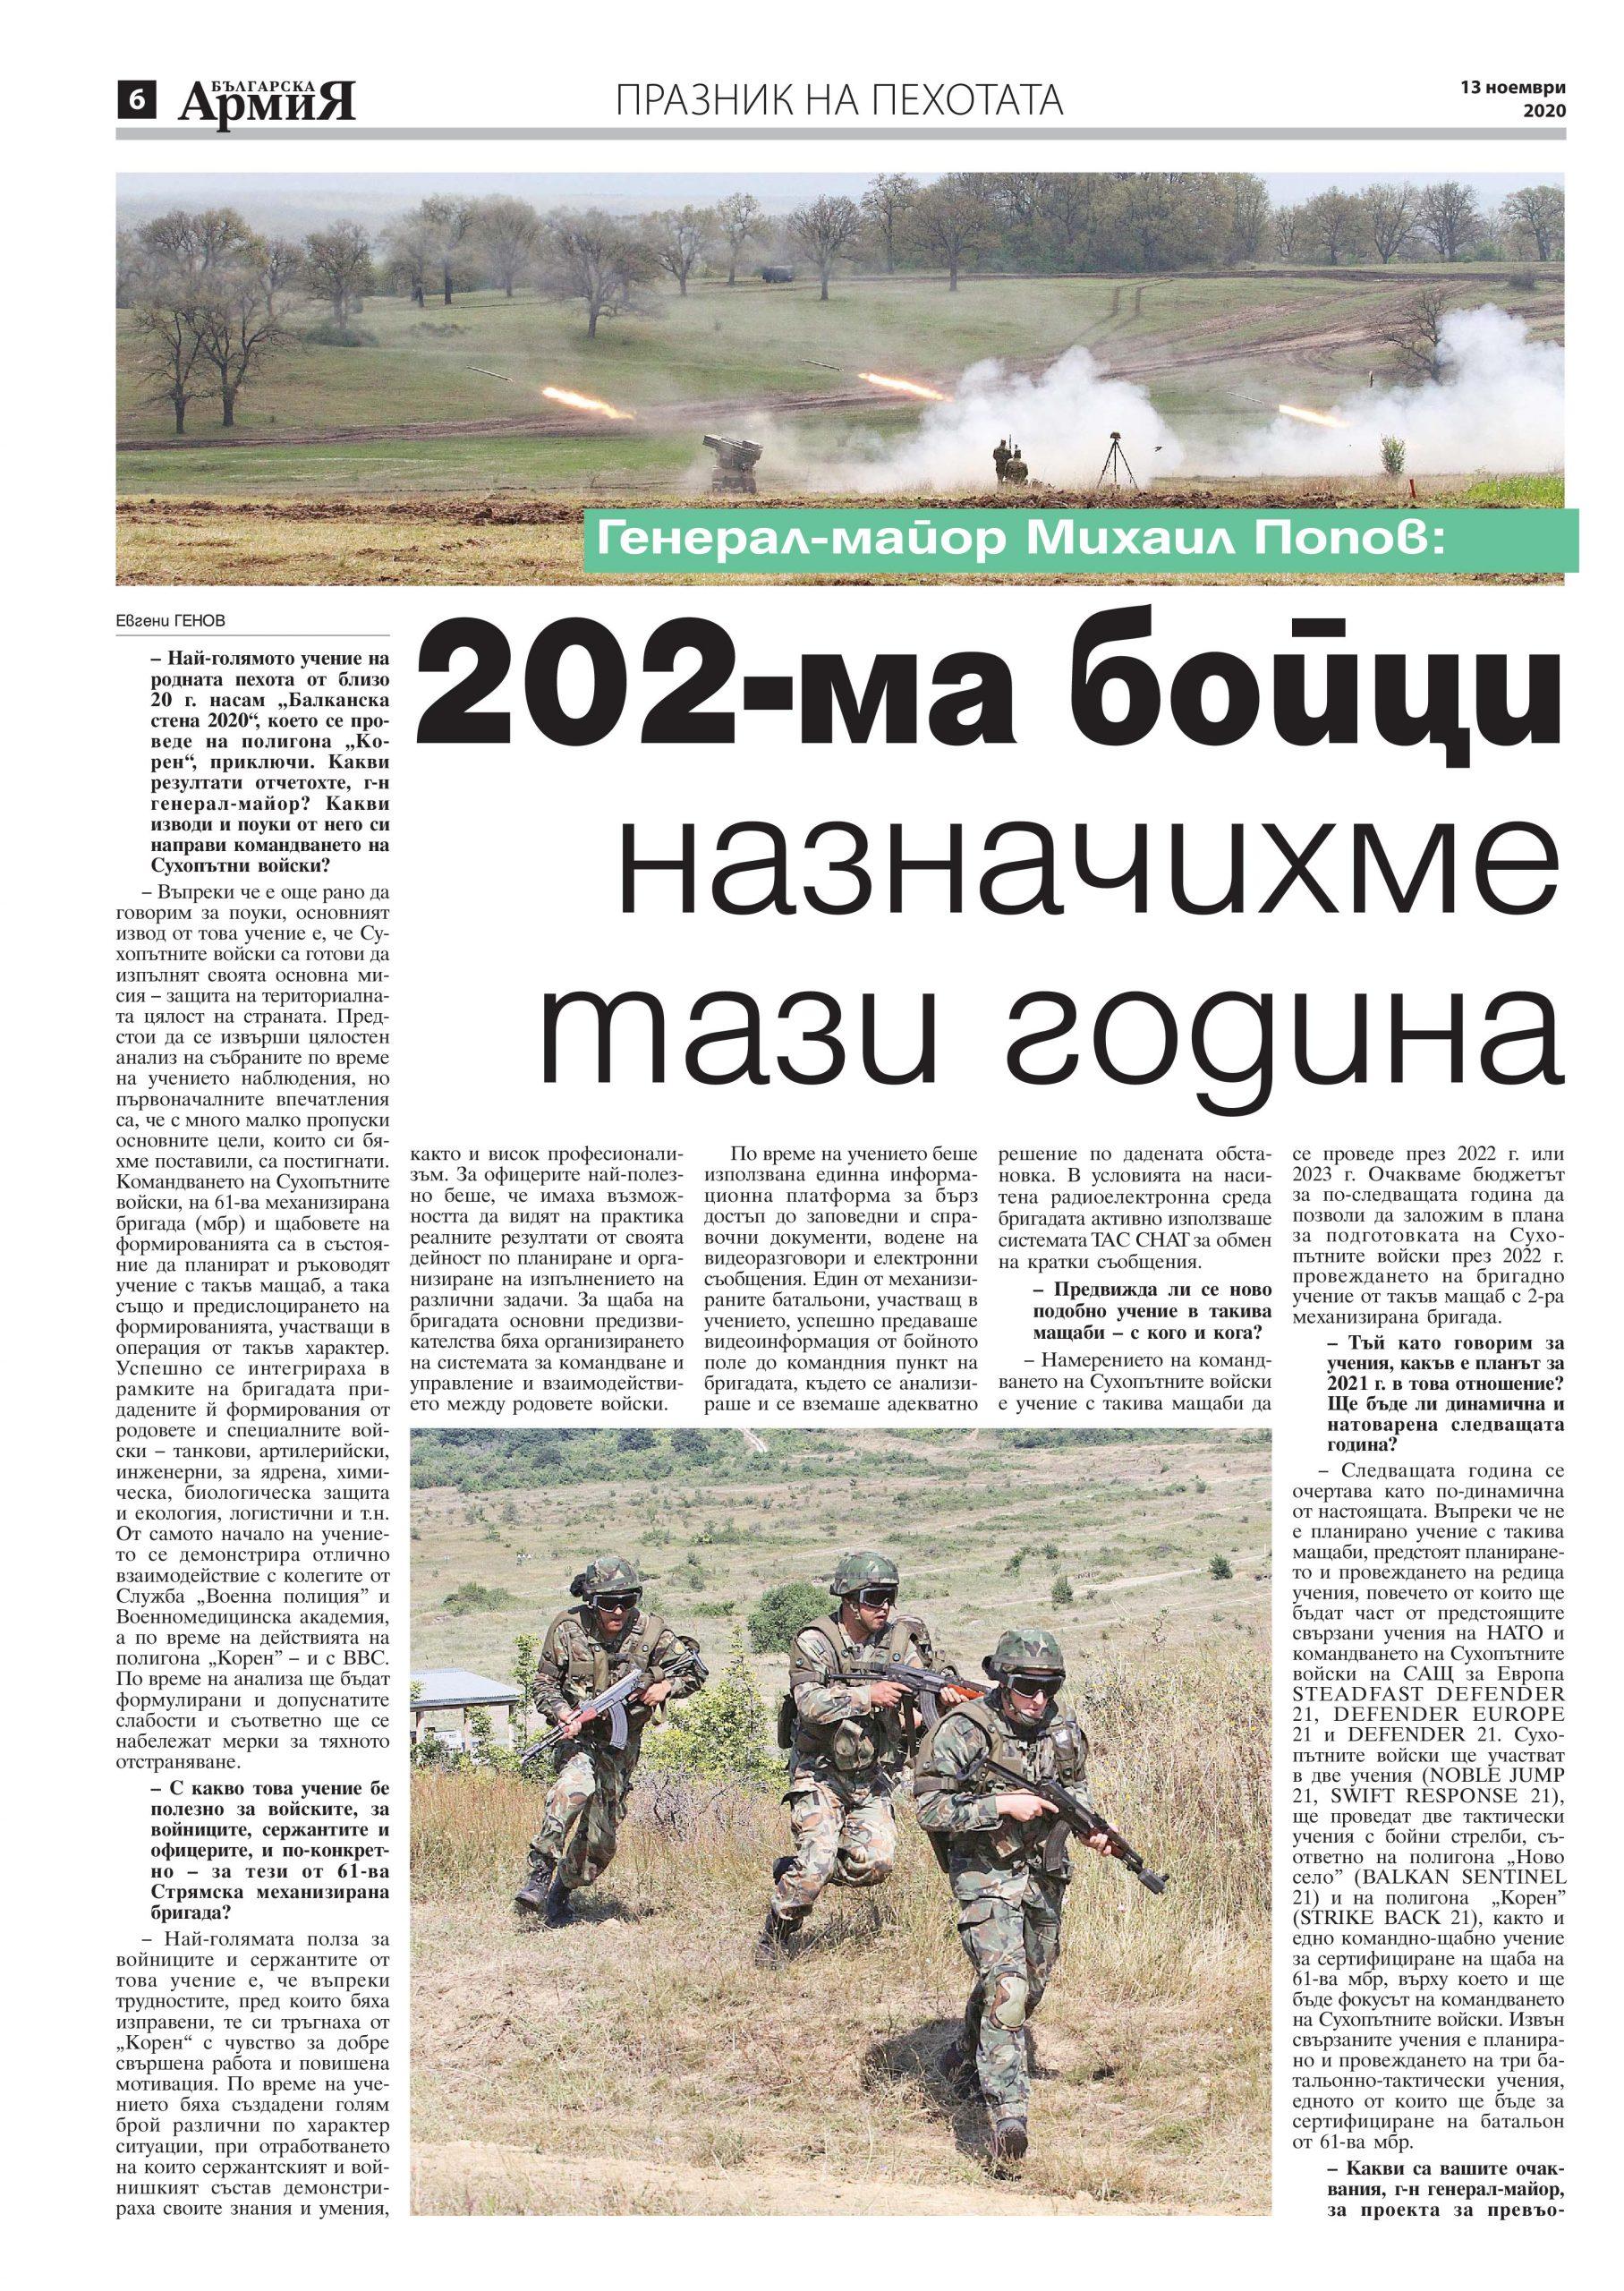 https://armymedia.bg/wp-content/uploads/2015/06/06-47-scaled.jpg